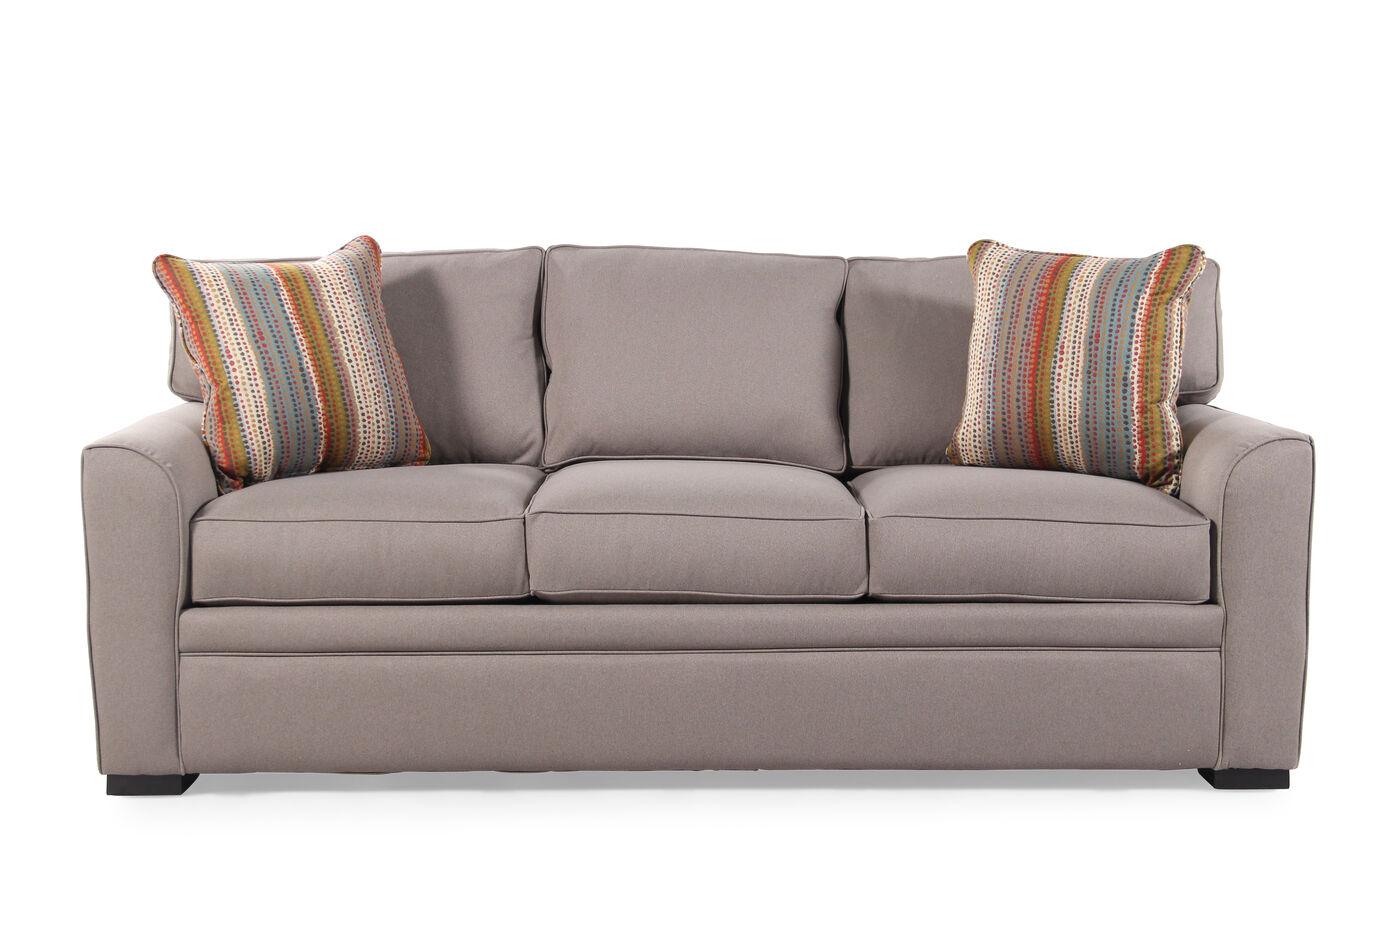 traditional sleeper sofa. Traditional 83\u0026quot; Queen Sleeper Sofa In Caf\u0026eacute; Au Lait C